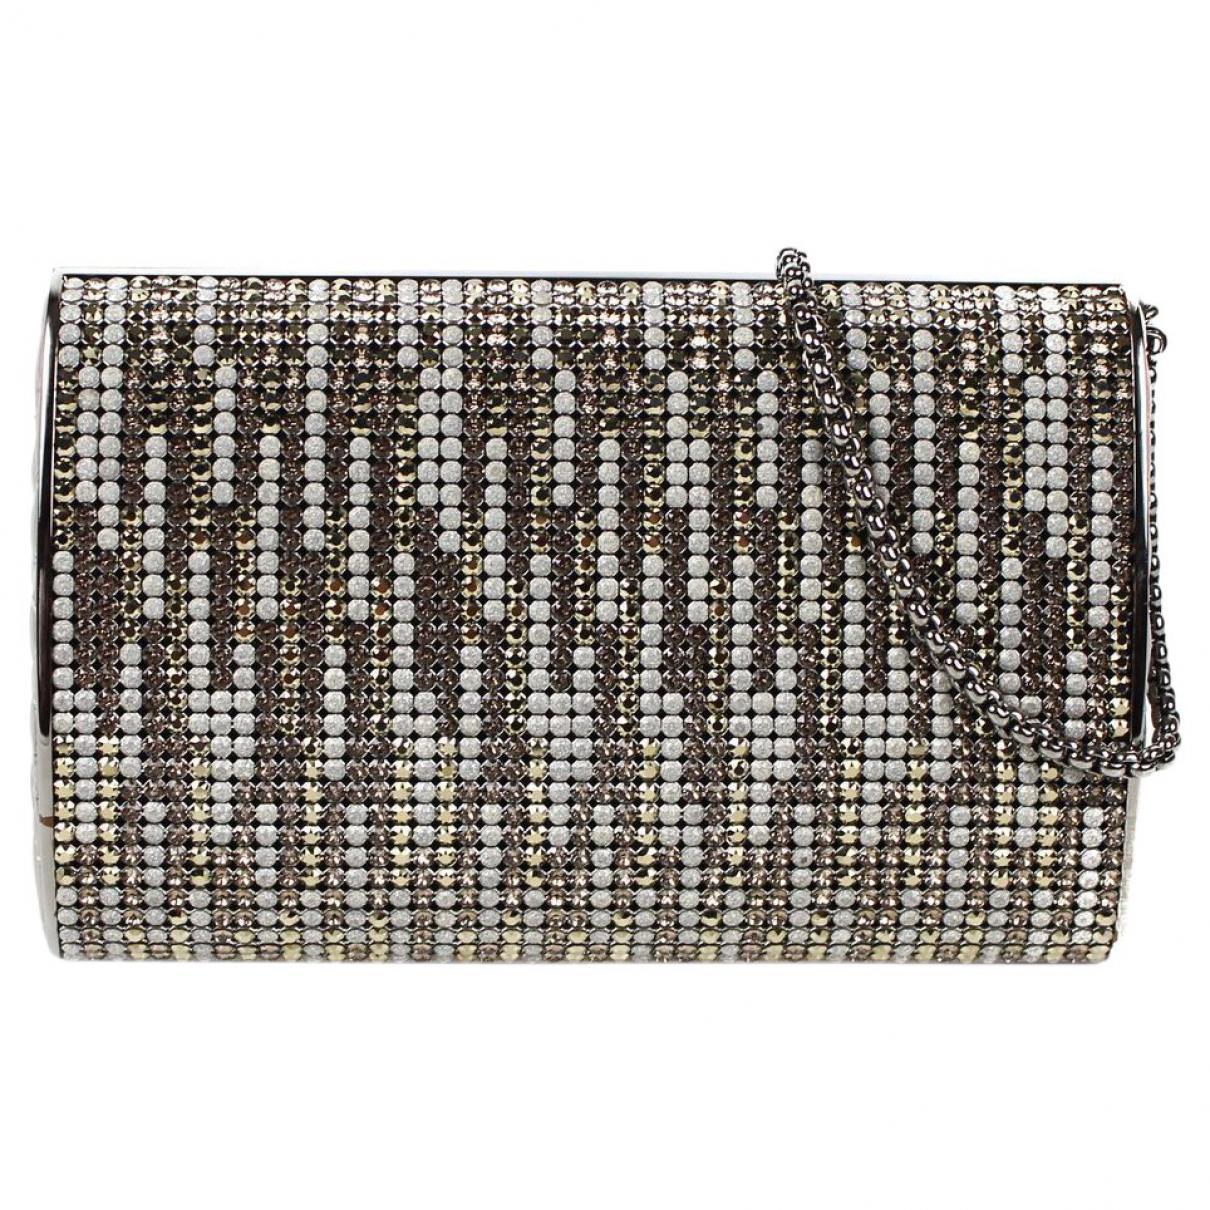 7904272b61ee Chanel. Women s Metallic Clutch Bag. £3